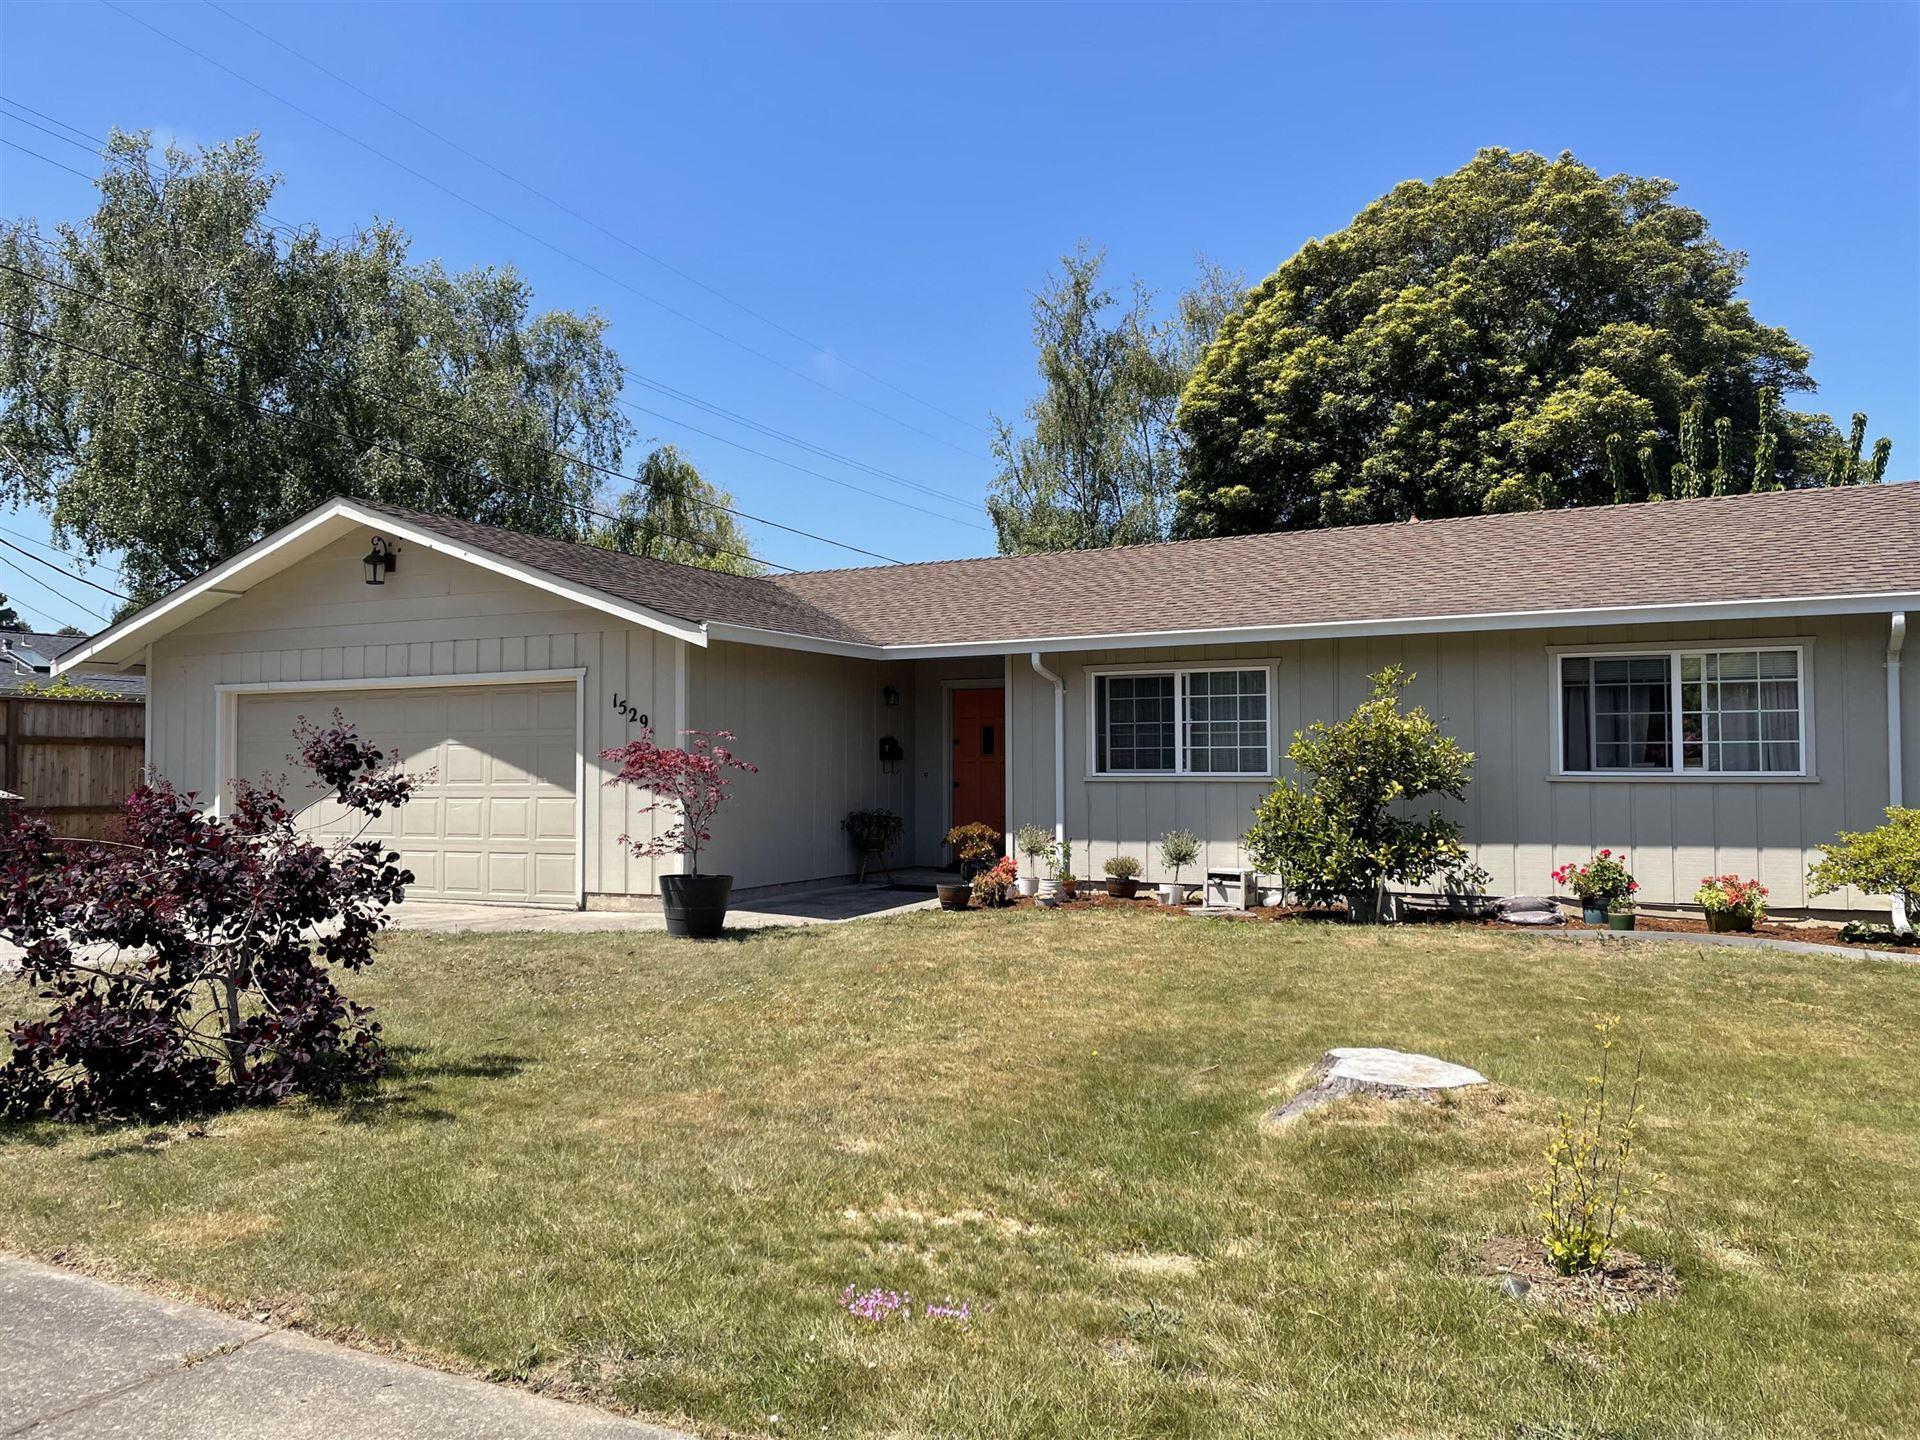 1529 E Wabash Avenue, Eureka, CA 95501 - MLS#: 259144